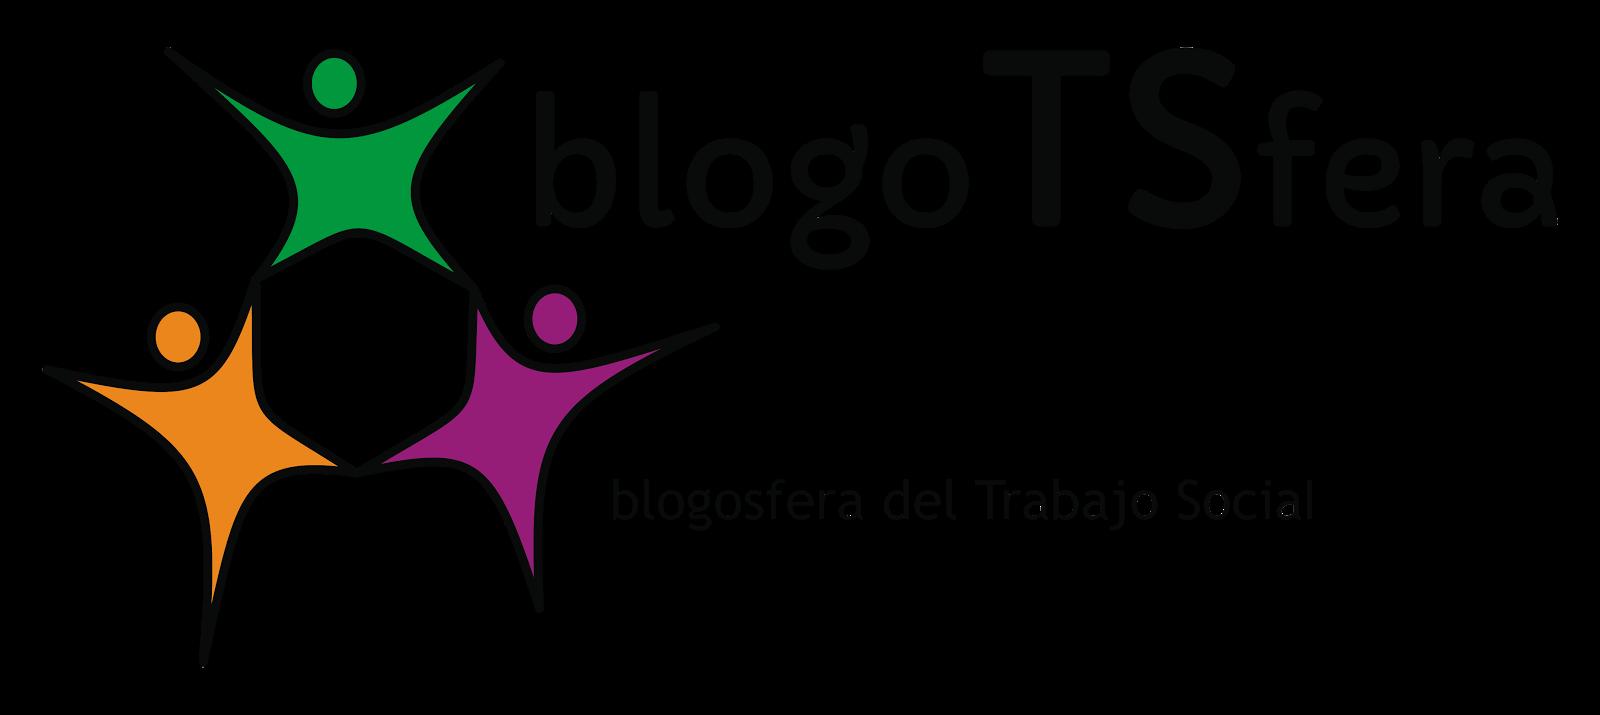 Pertenezco a la BlogoTSfera